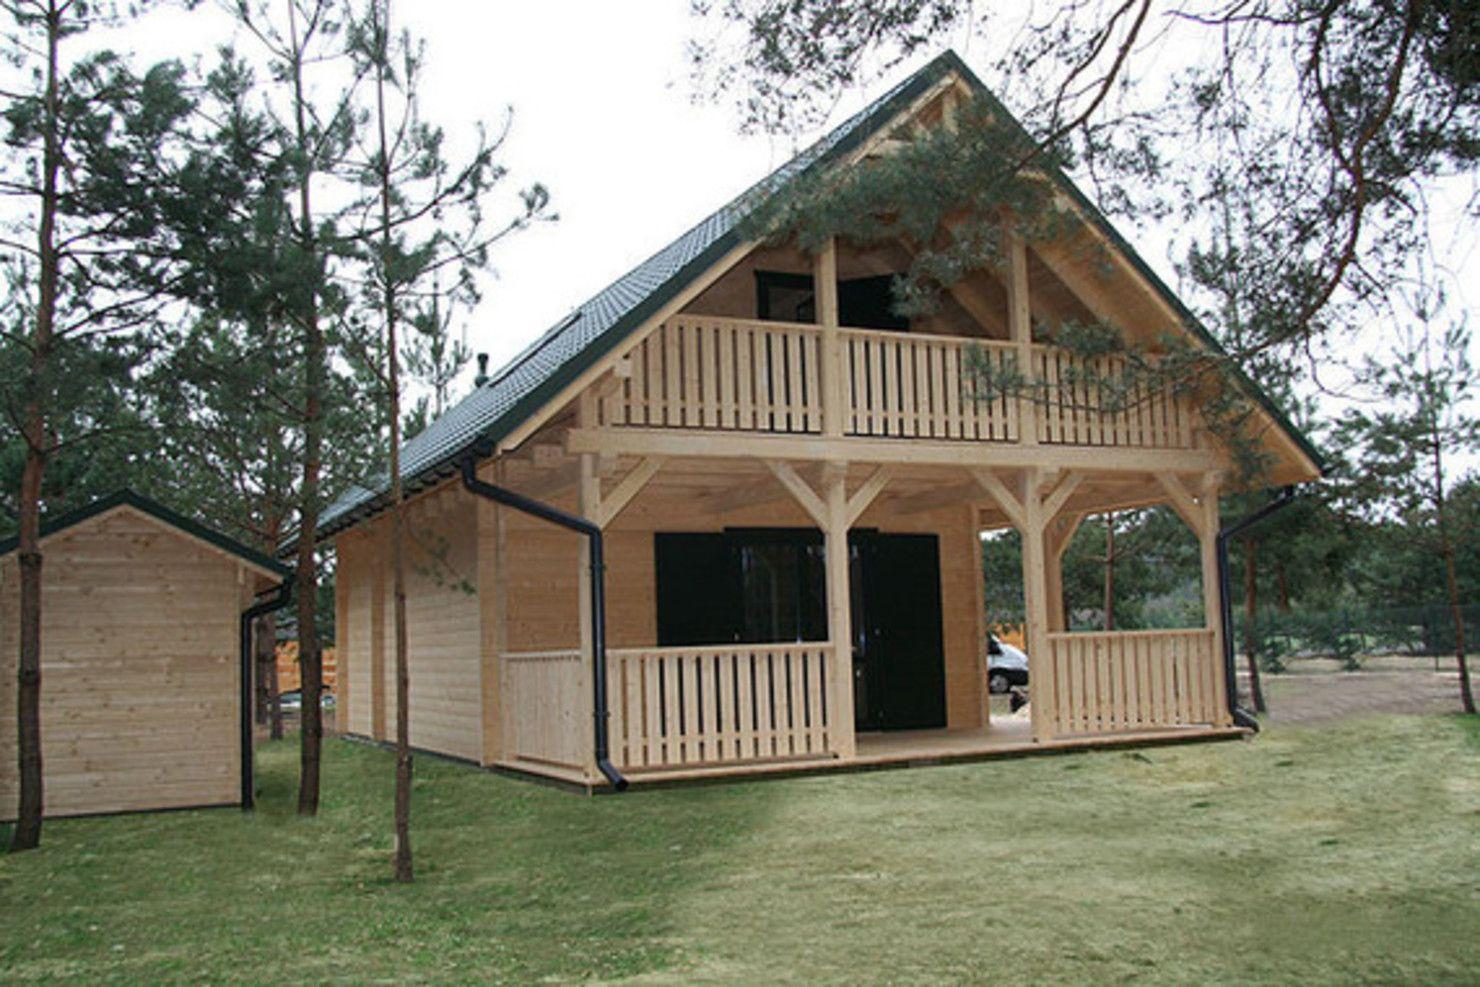 Interni Case Prefabbricate In Legno case prefabbricate in legno: vantaggi e svantaggi | case